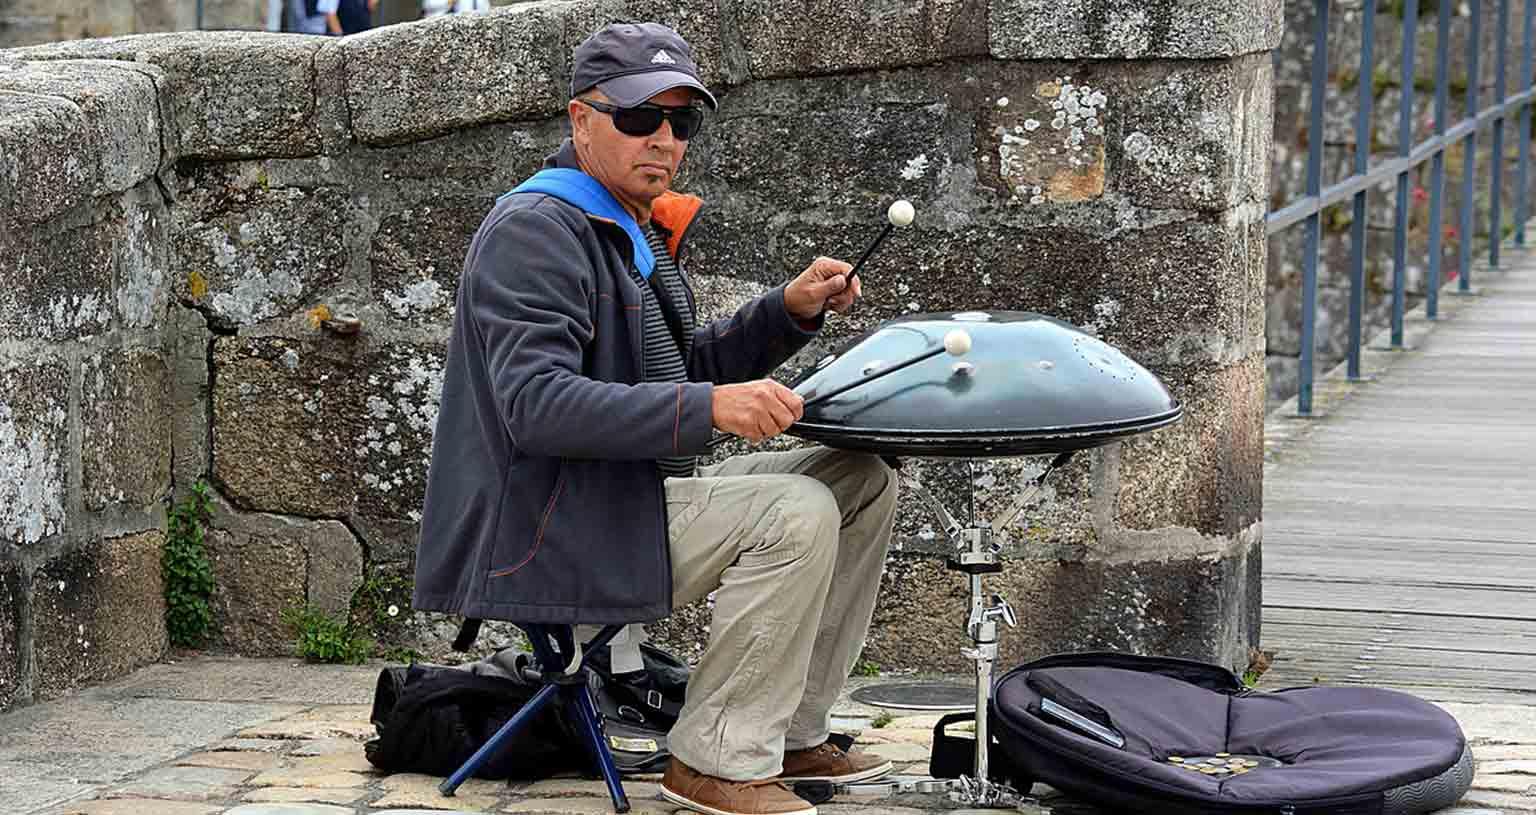 arbeiten-unterwegs-geld-verdienen-vanlife-strassenmusiker